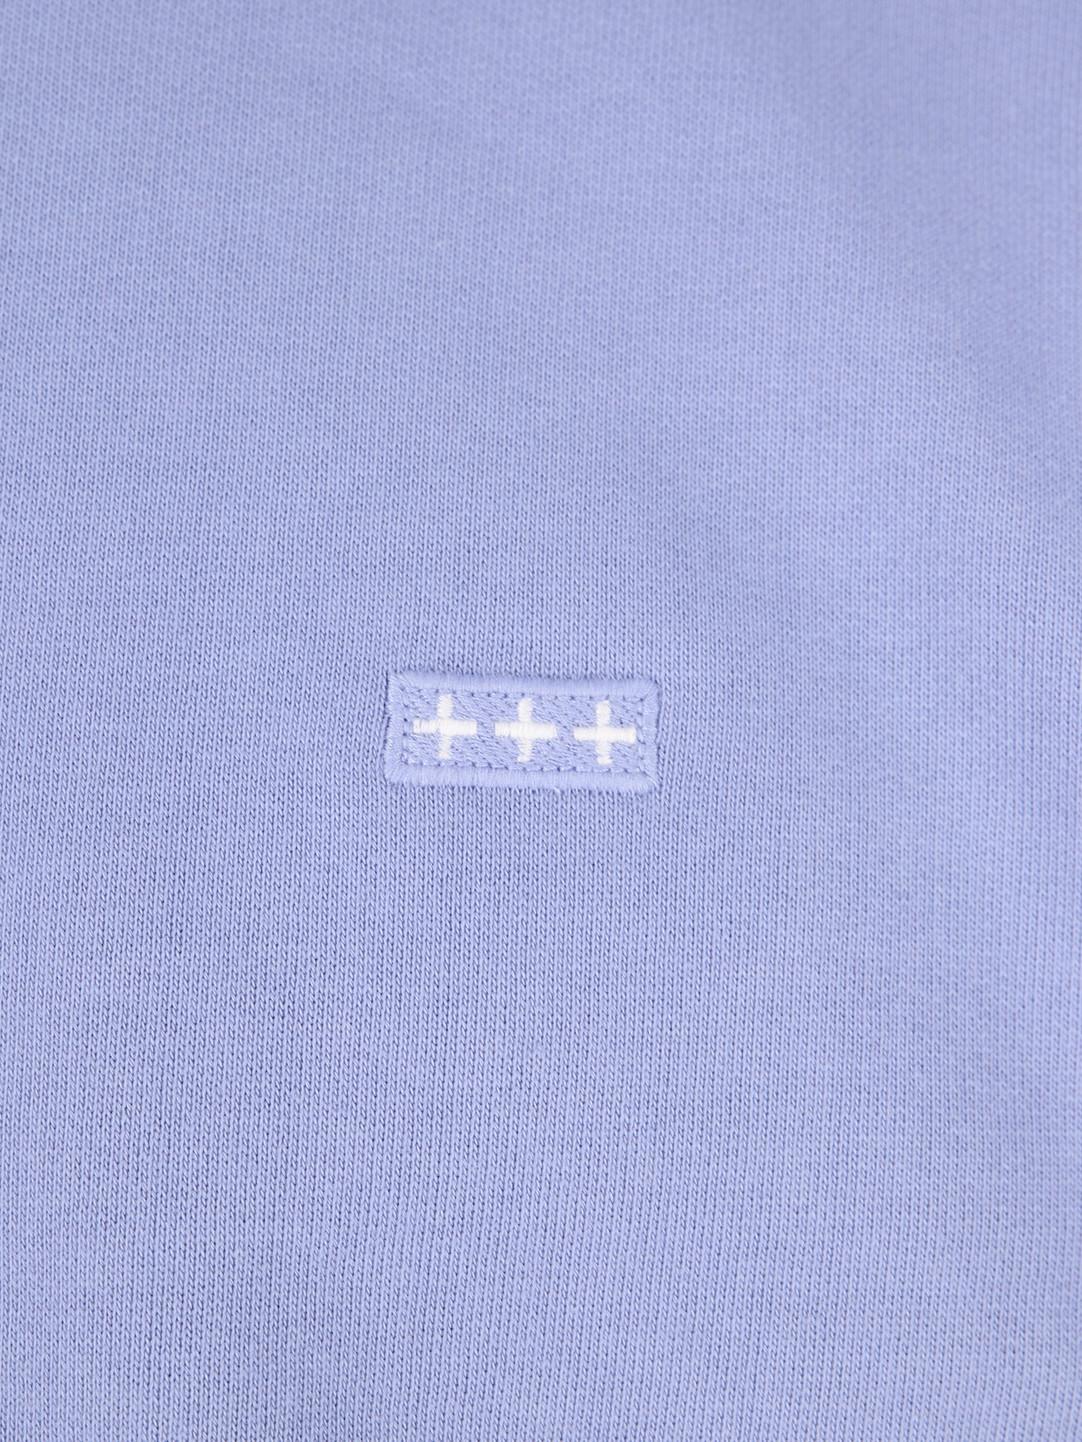 Quality Blanks Quality Blanks QB94 Patch Logo Crewneck Lavender